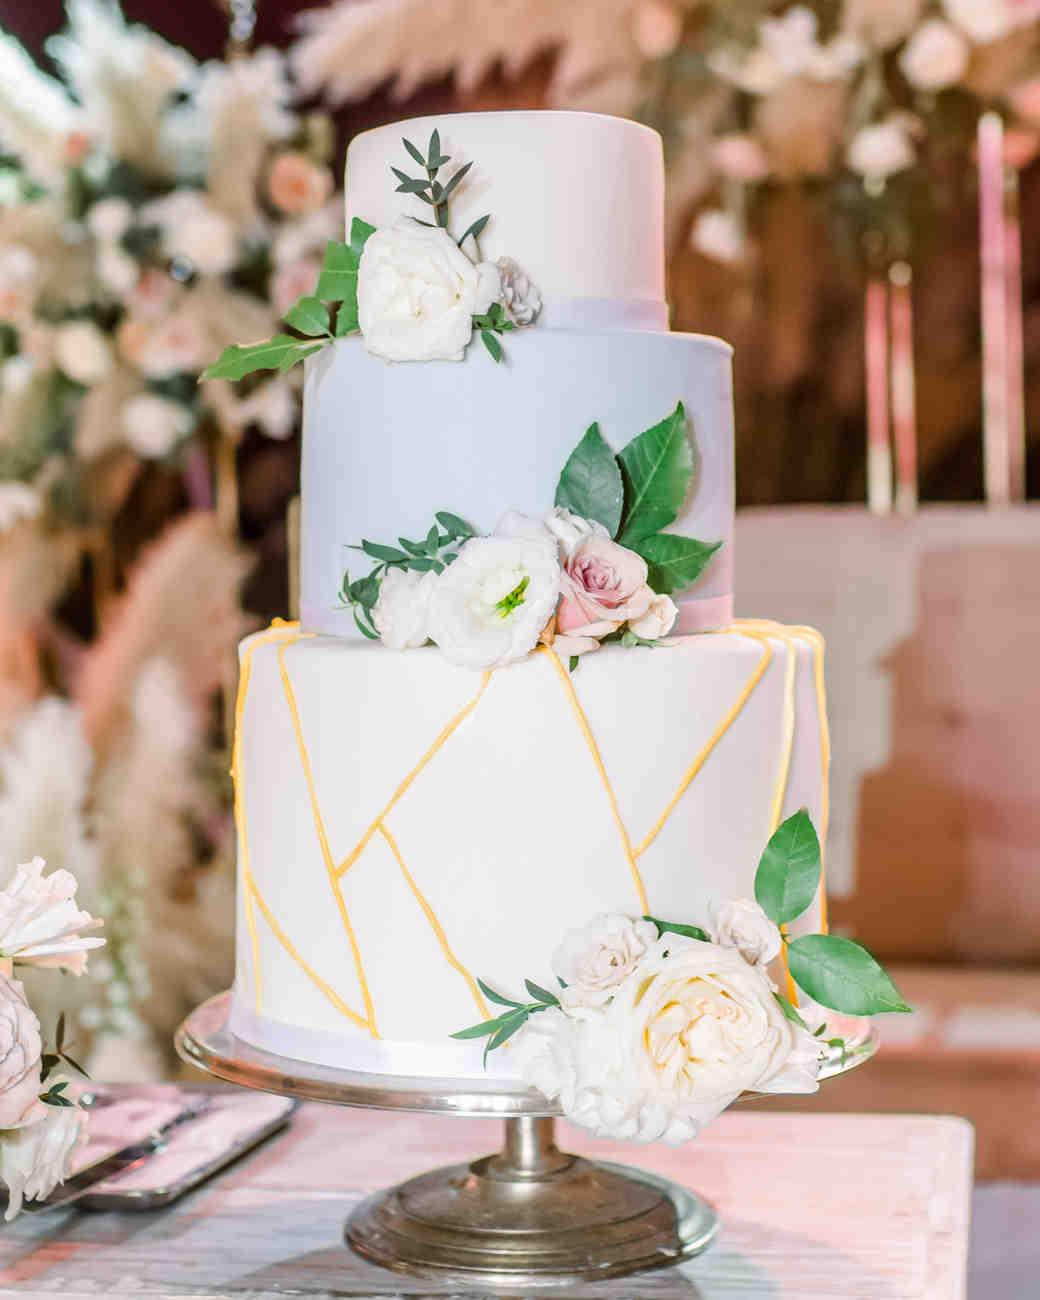 three tiered geometric design wedding cake with rose embellishments